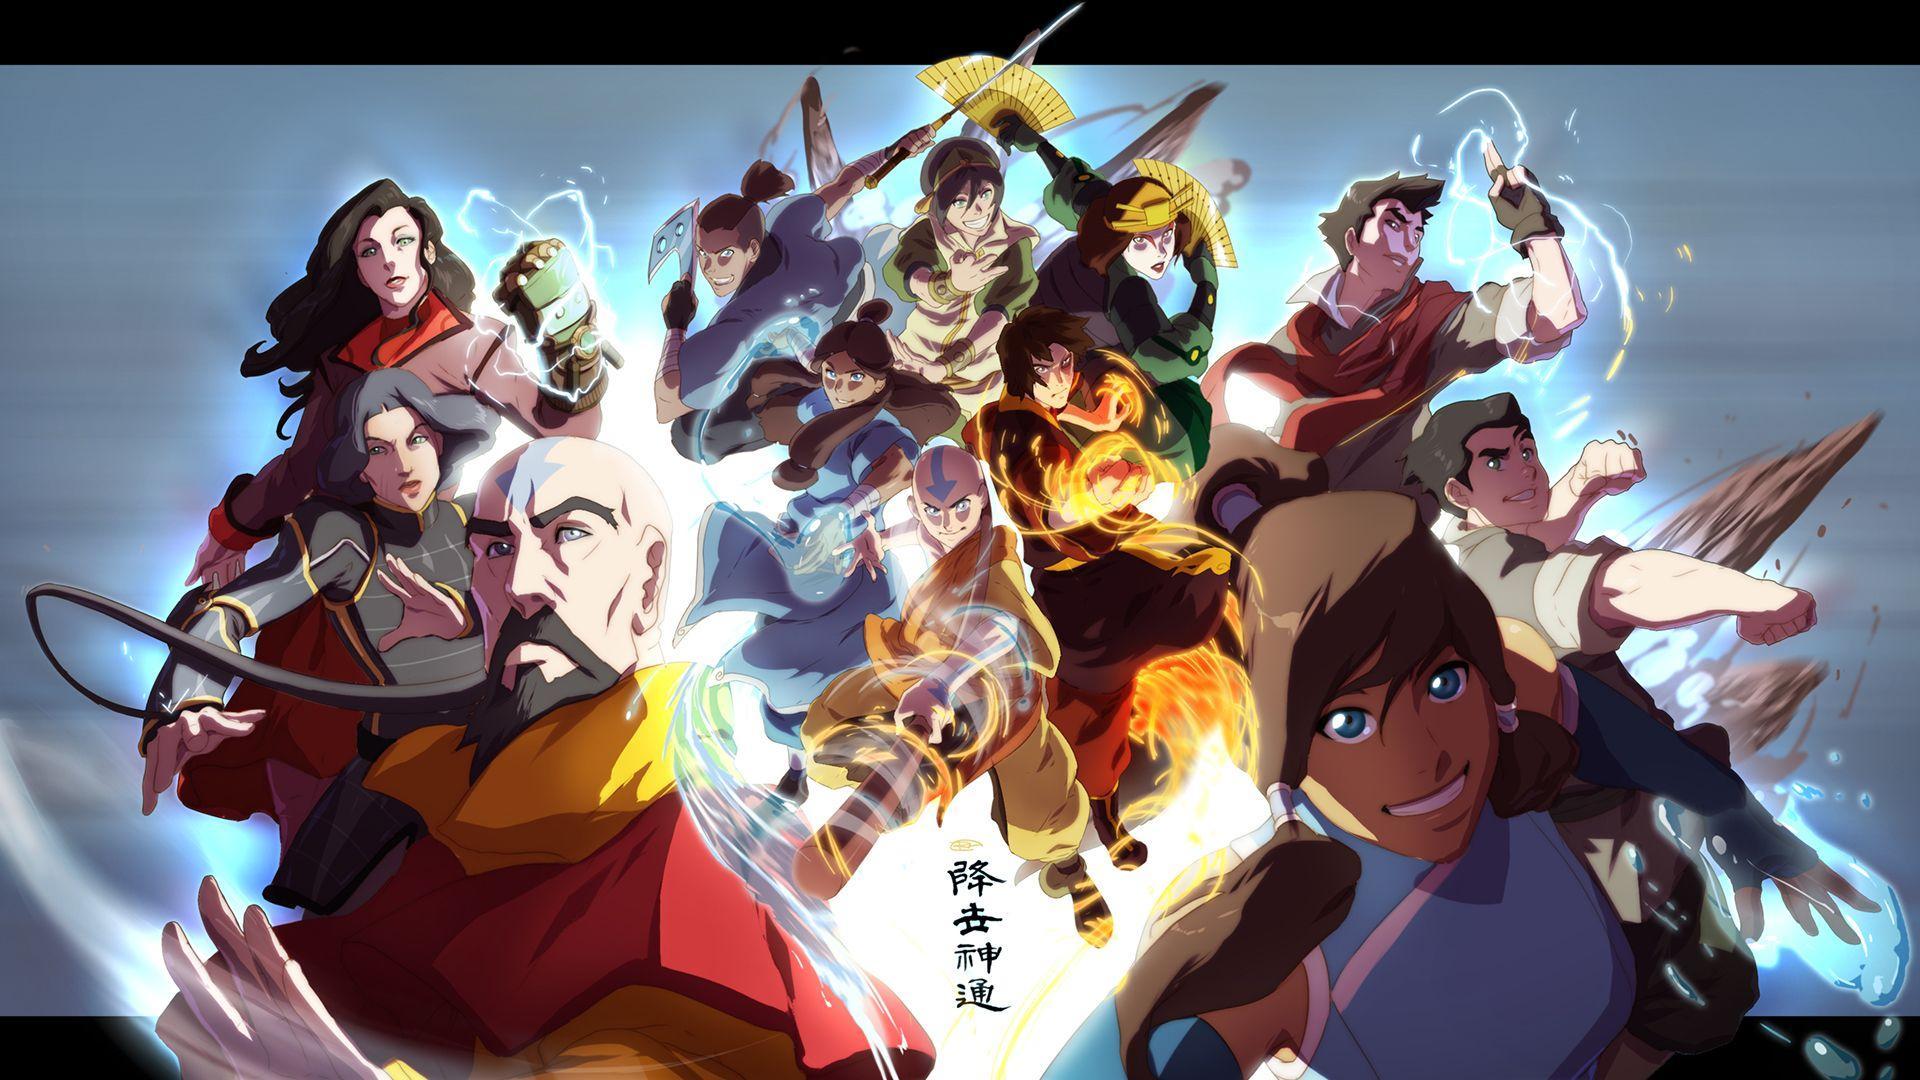 Unduh 660+ Wallpaper Anime Crossover Hd HD Gratid